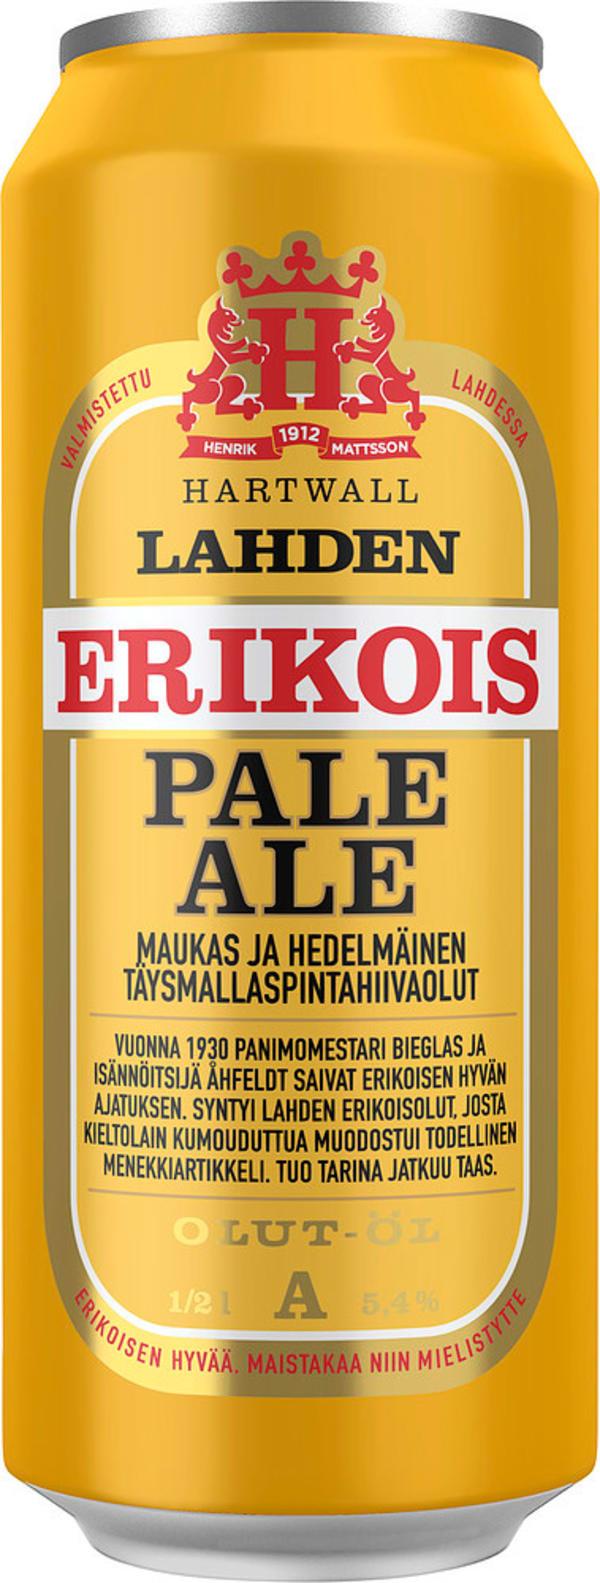 Lahden Erikois Pale Ale tölkki